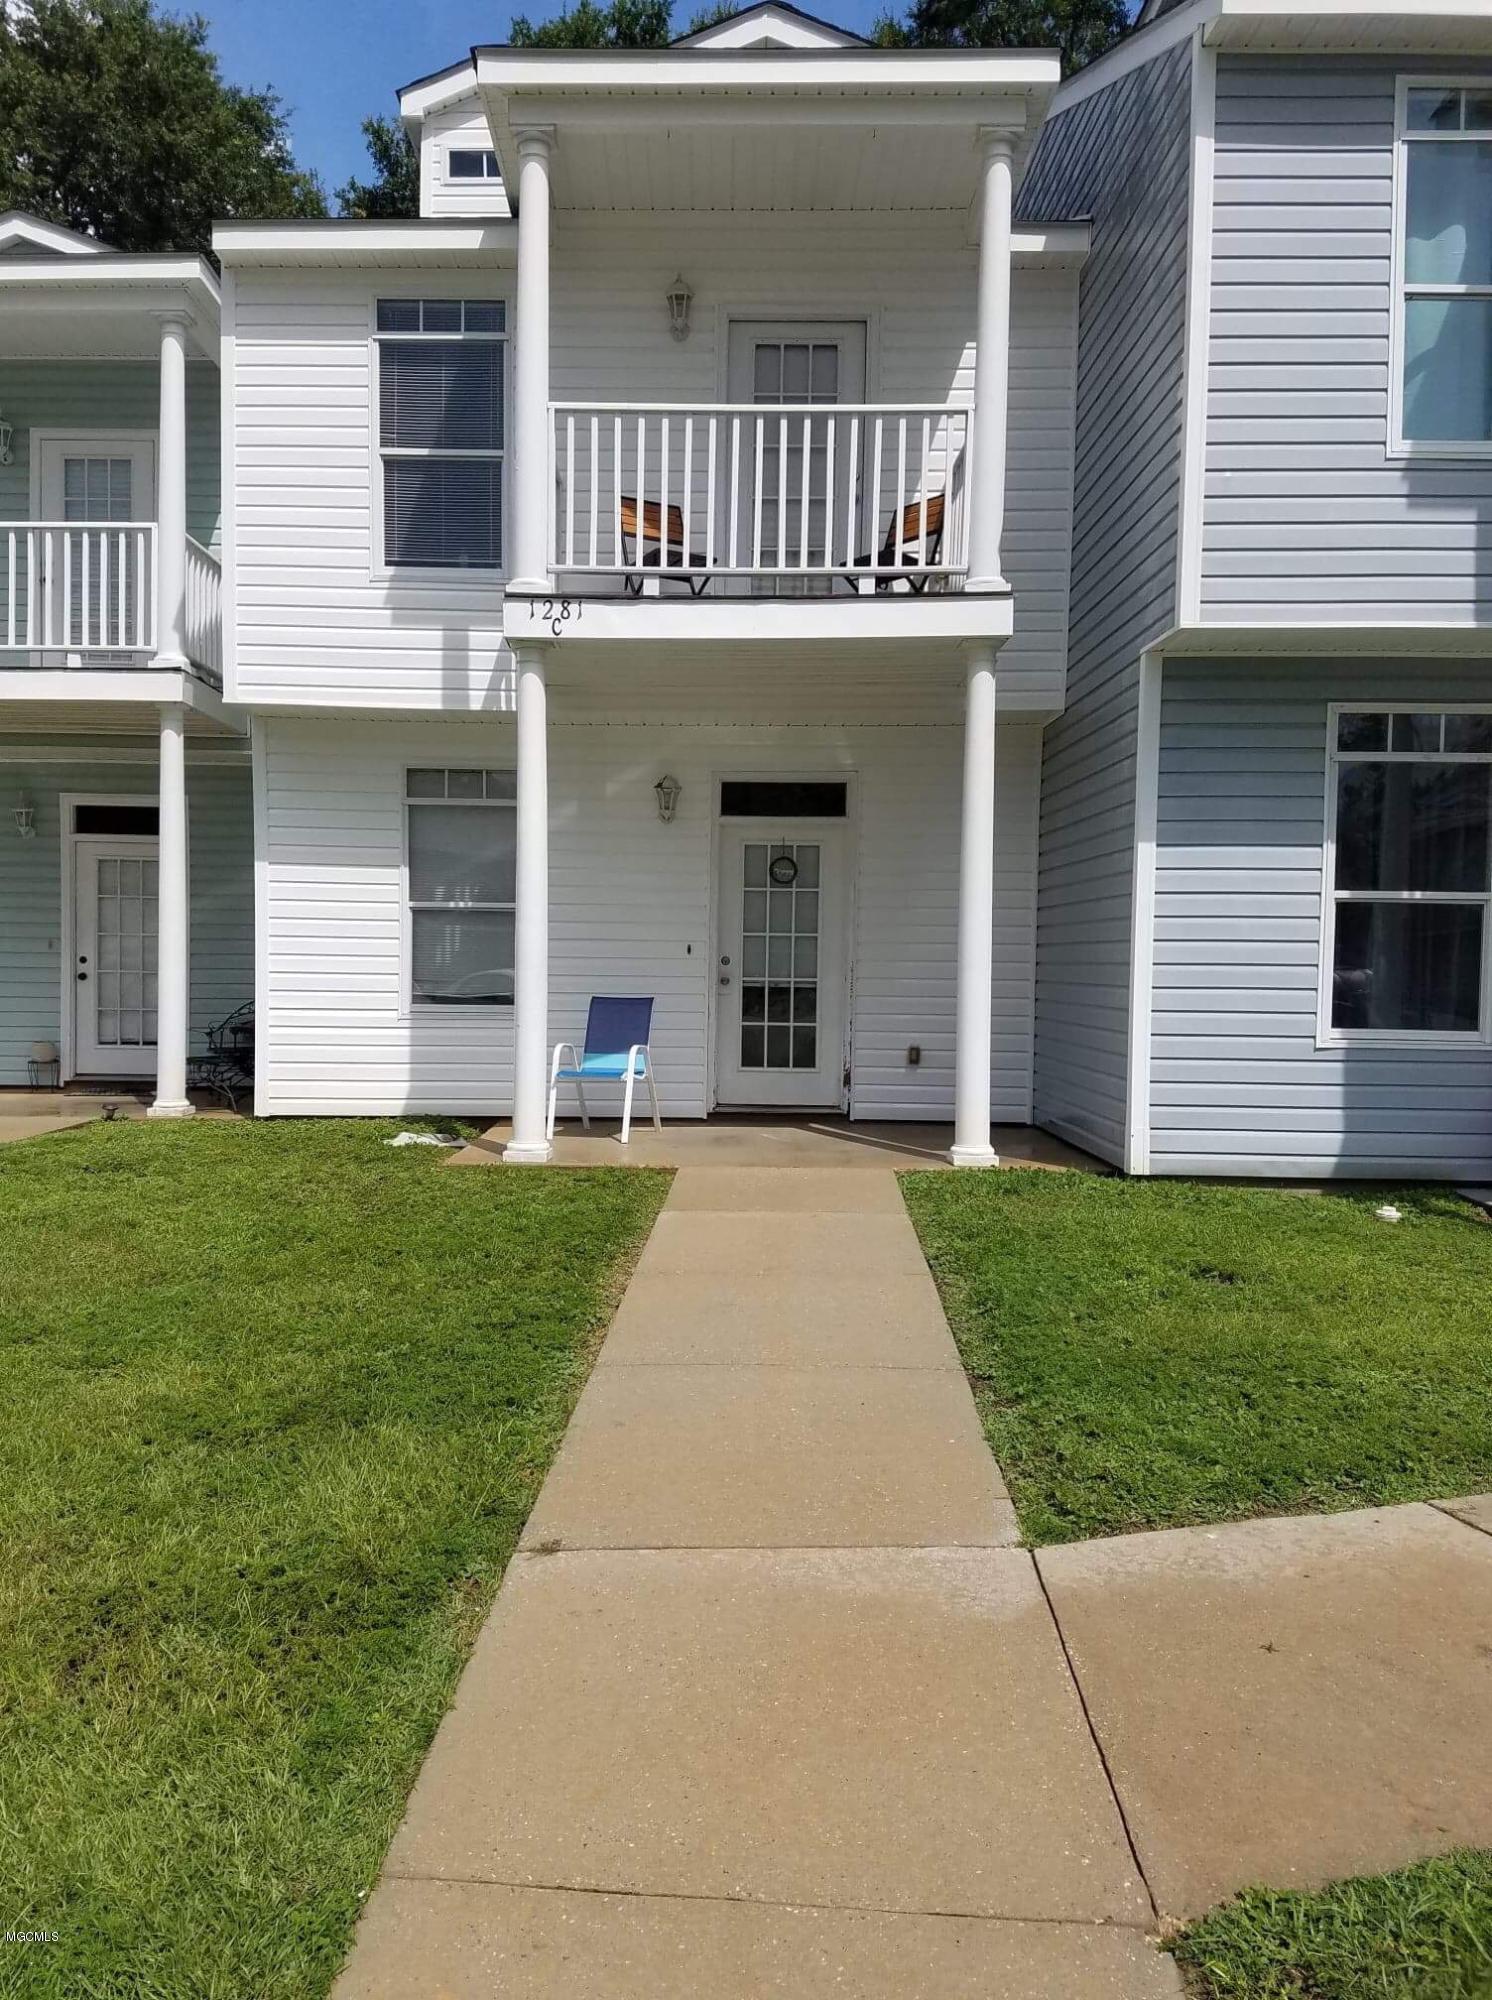 1281 Century Oaks Dr, Gulfport, Mississippi 39507, 3 Bedrooms Bedrooms, ,3 BathroomsBathrooms,Single-family,For Sale,Century Oaks,341148